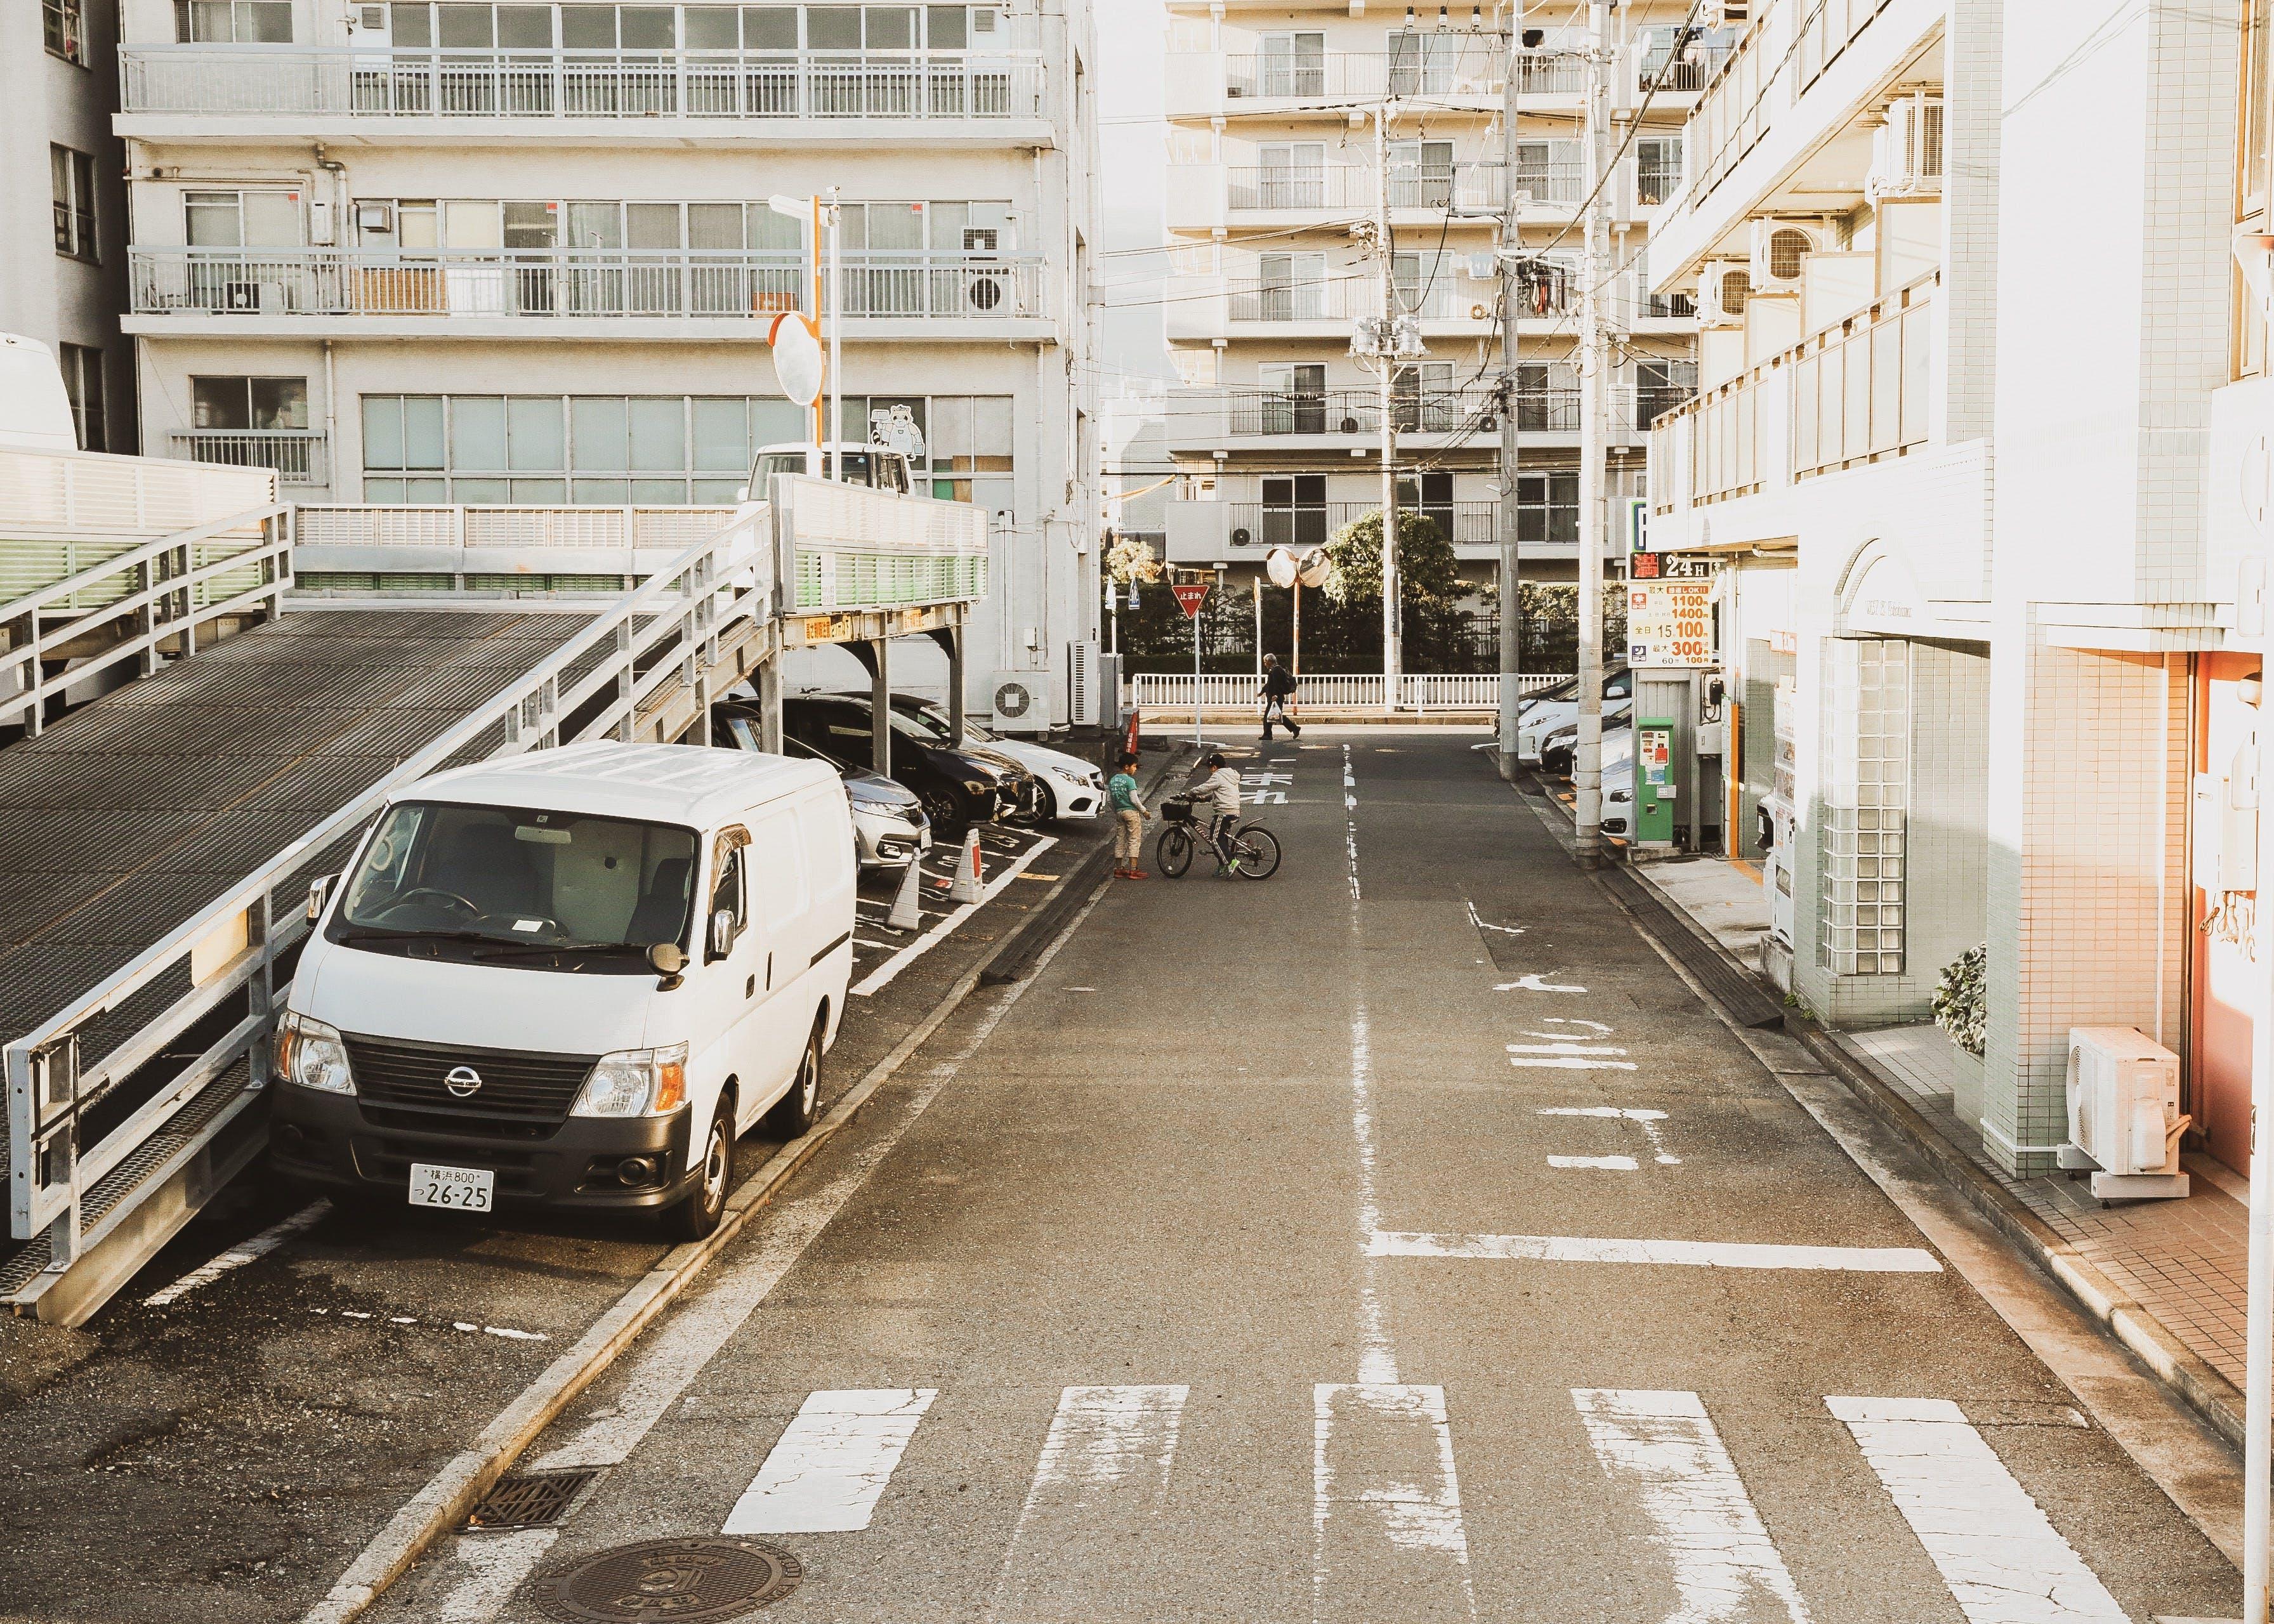 Kostenloses Stock Foto zu apartments, architektur, autos, fahrrad